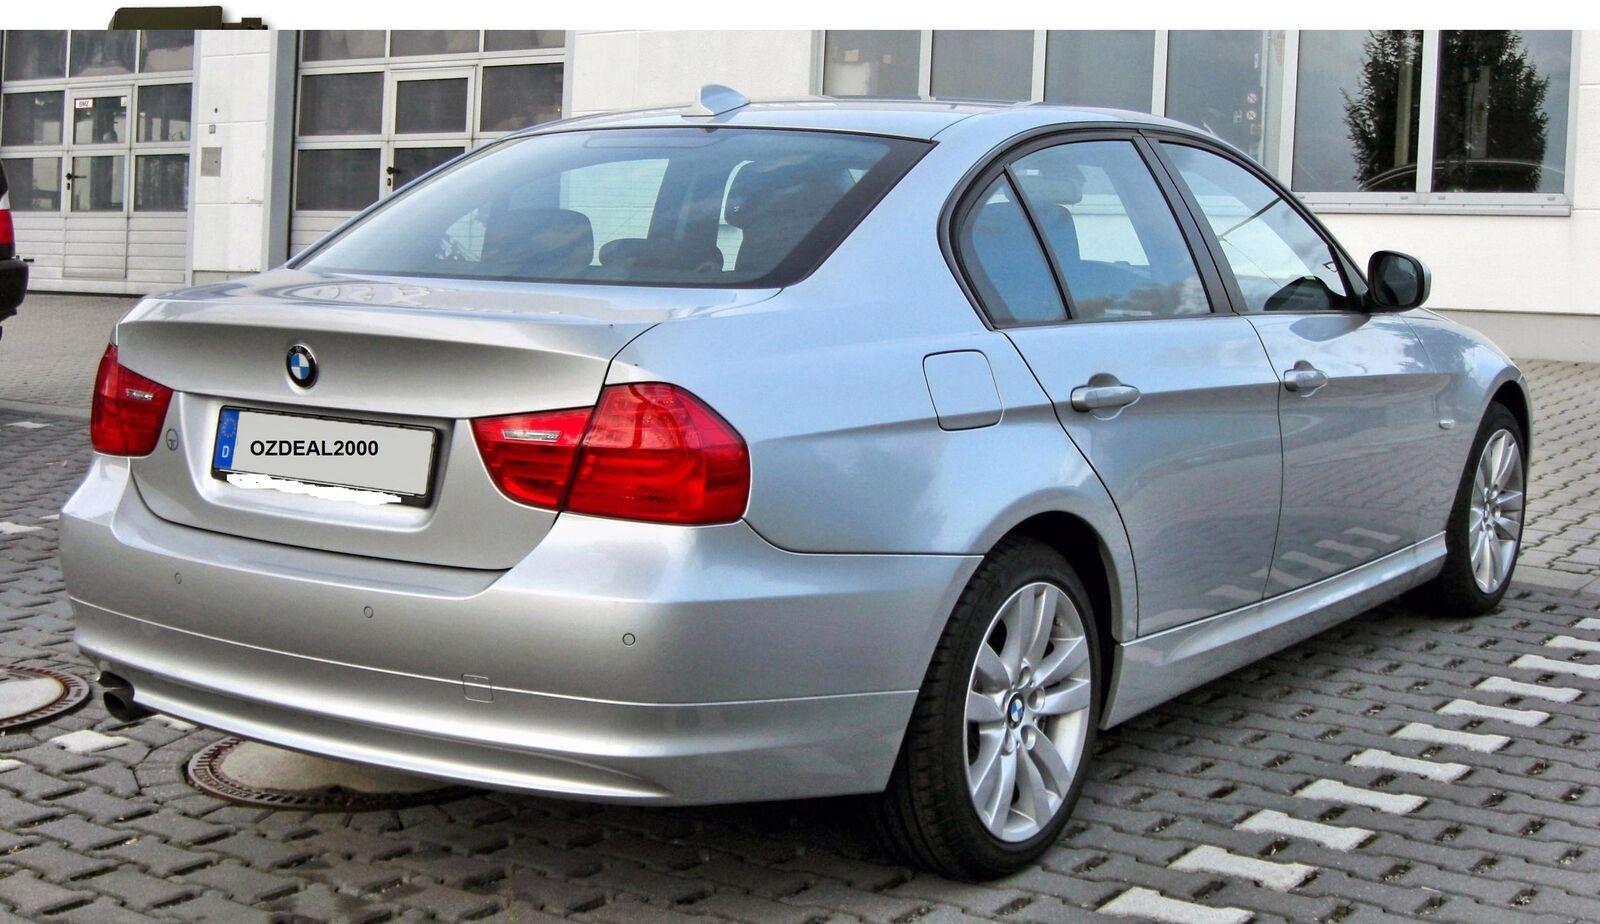 BMW E90 GENUINE LED TAIL LIGHT REAR RIGHT 2008-12 320i 323i 325i 330i 335i 320d